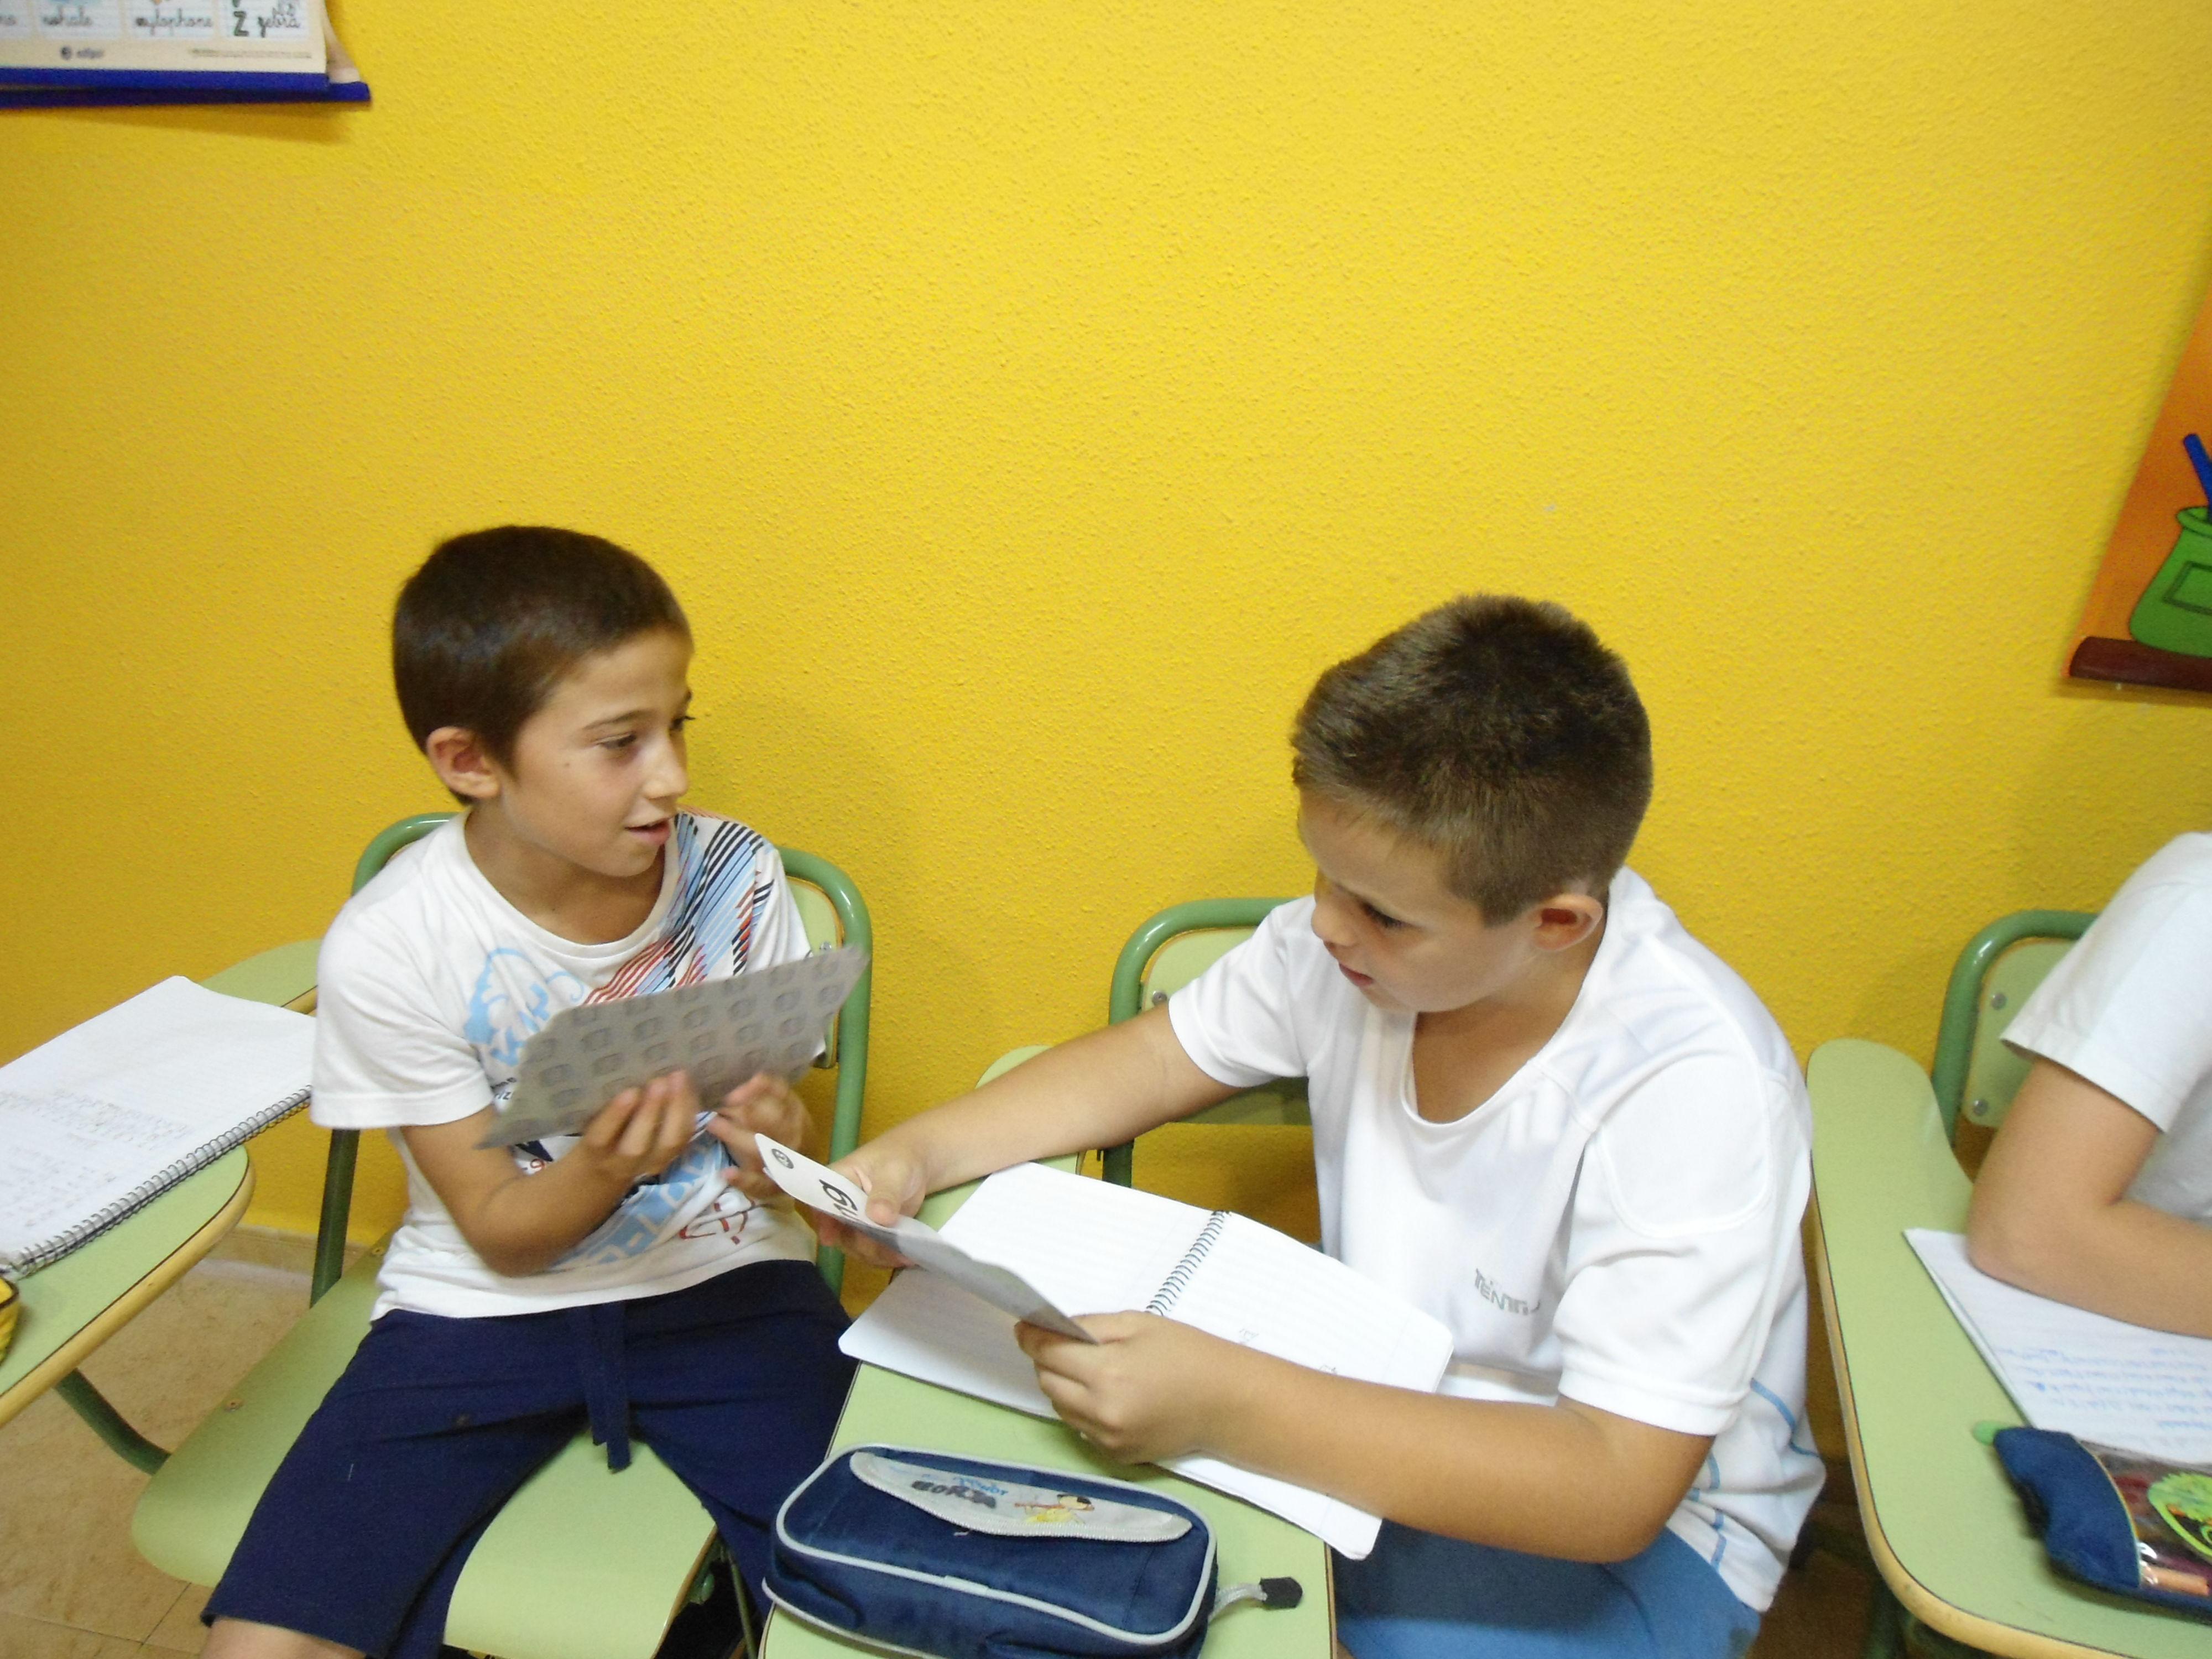 Foto 36 de Academias de idiomas en Moncada | Centre d'Estudis Etnies